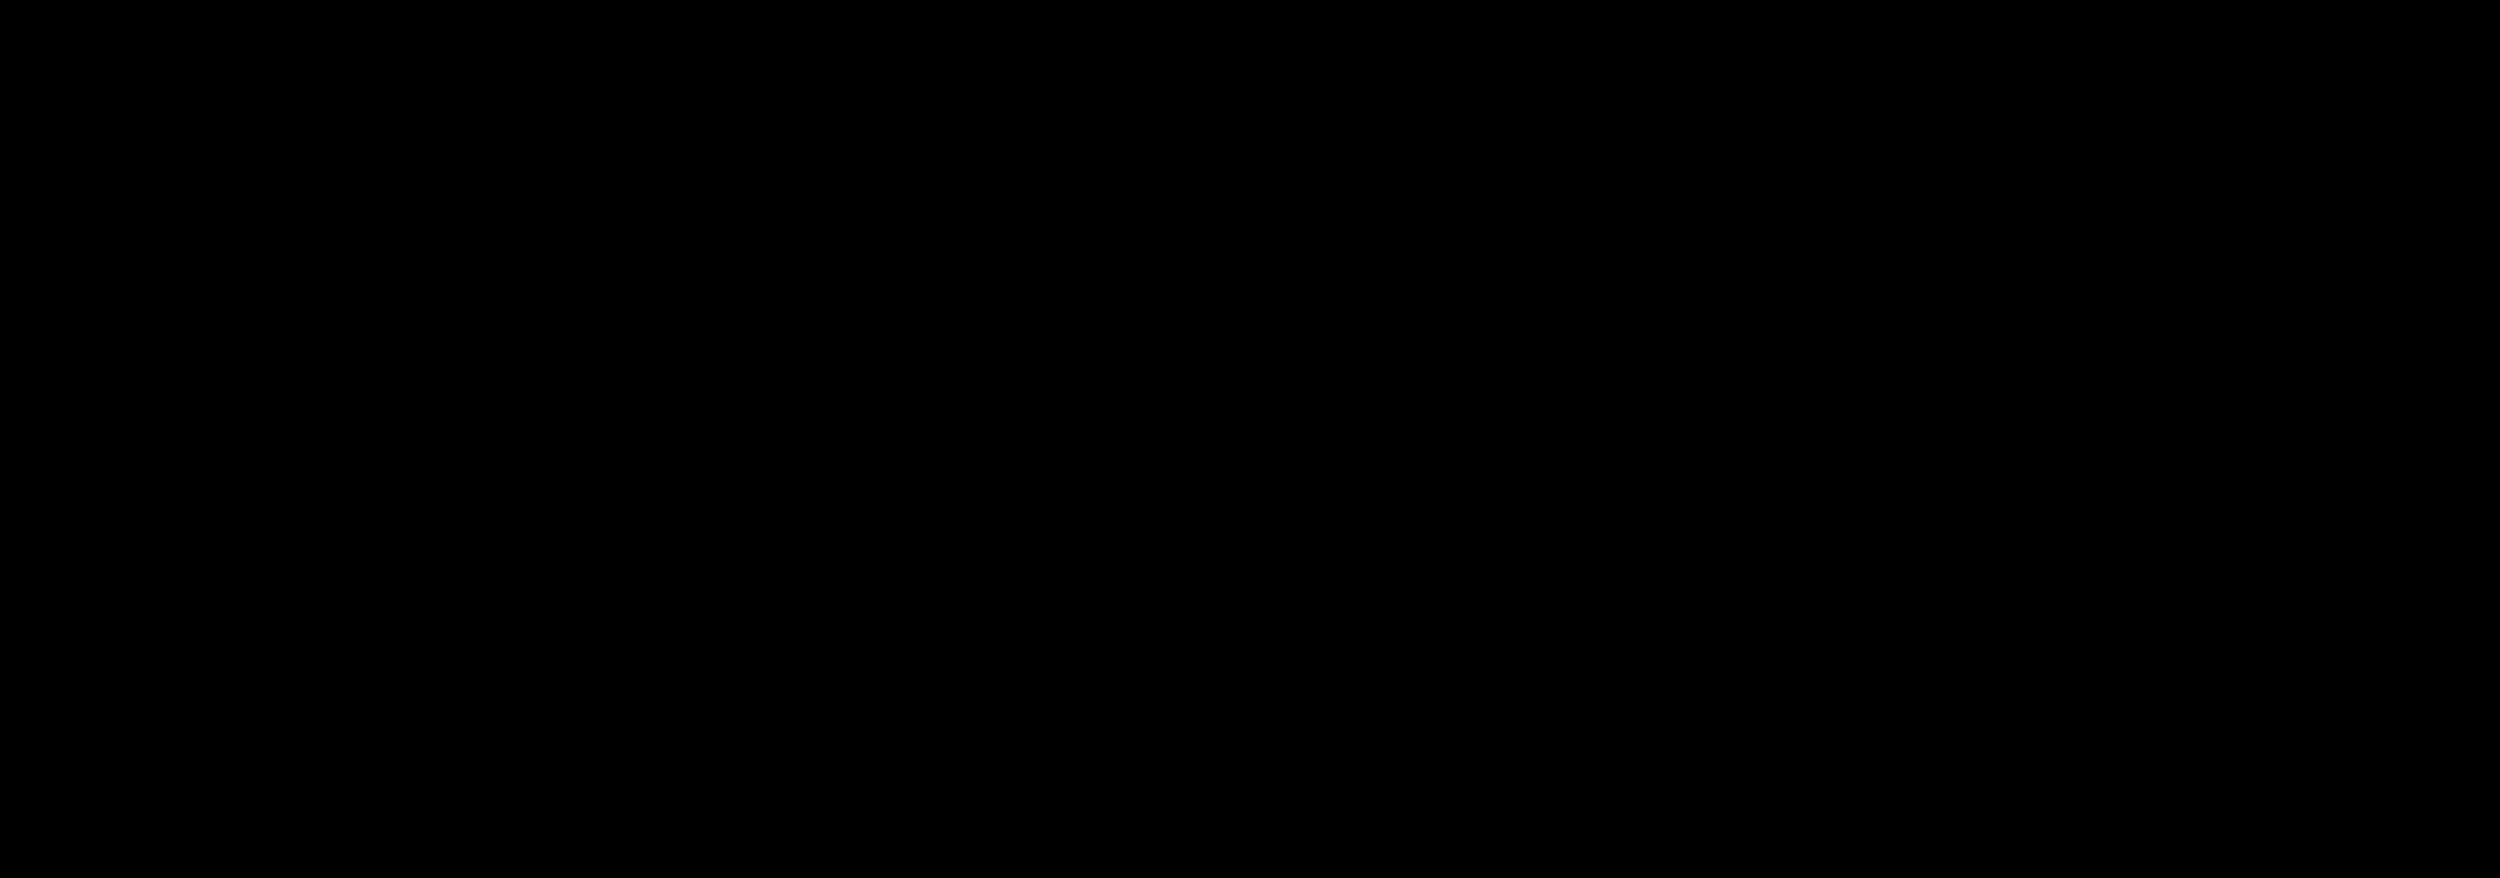 Arabescos Vector